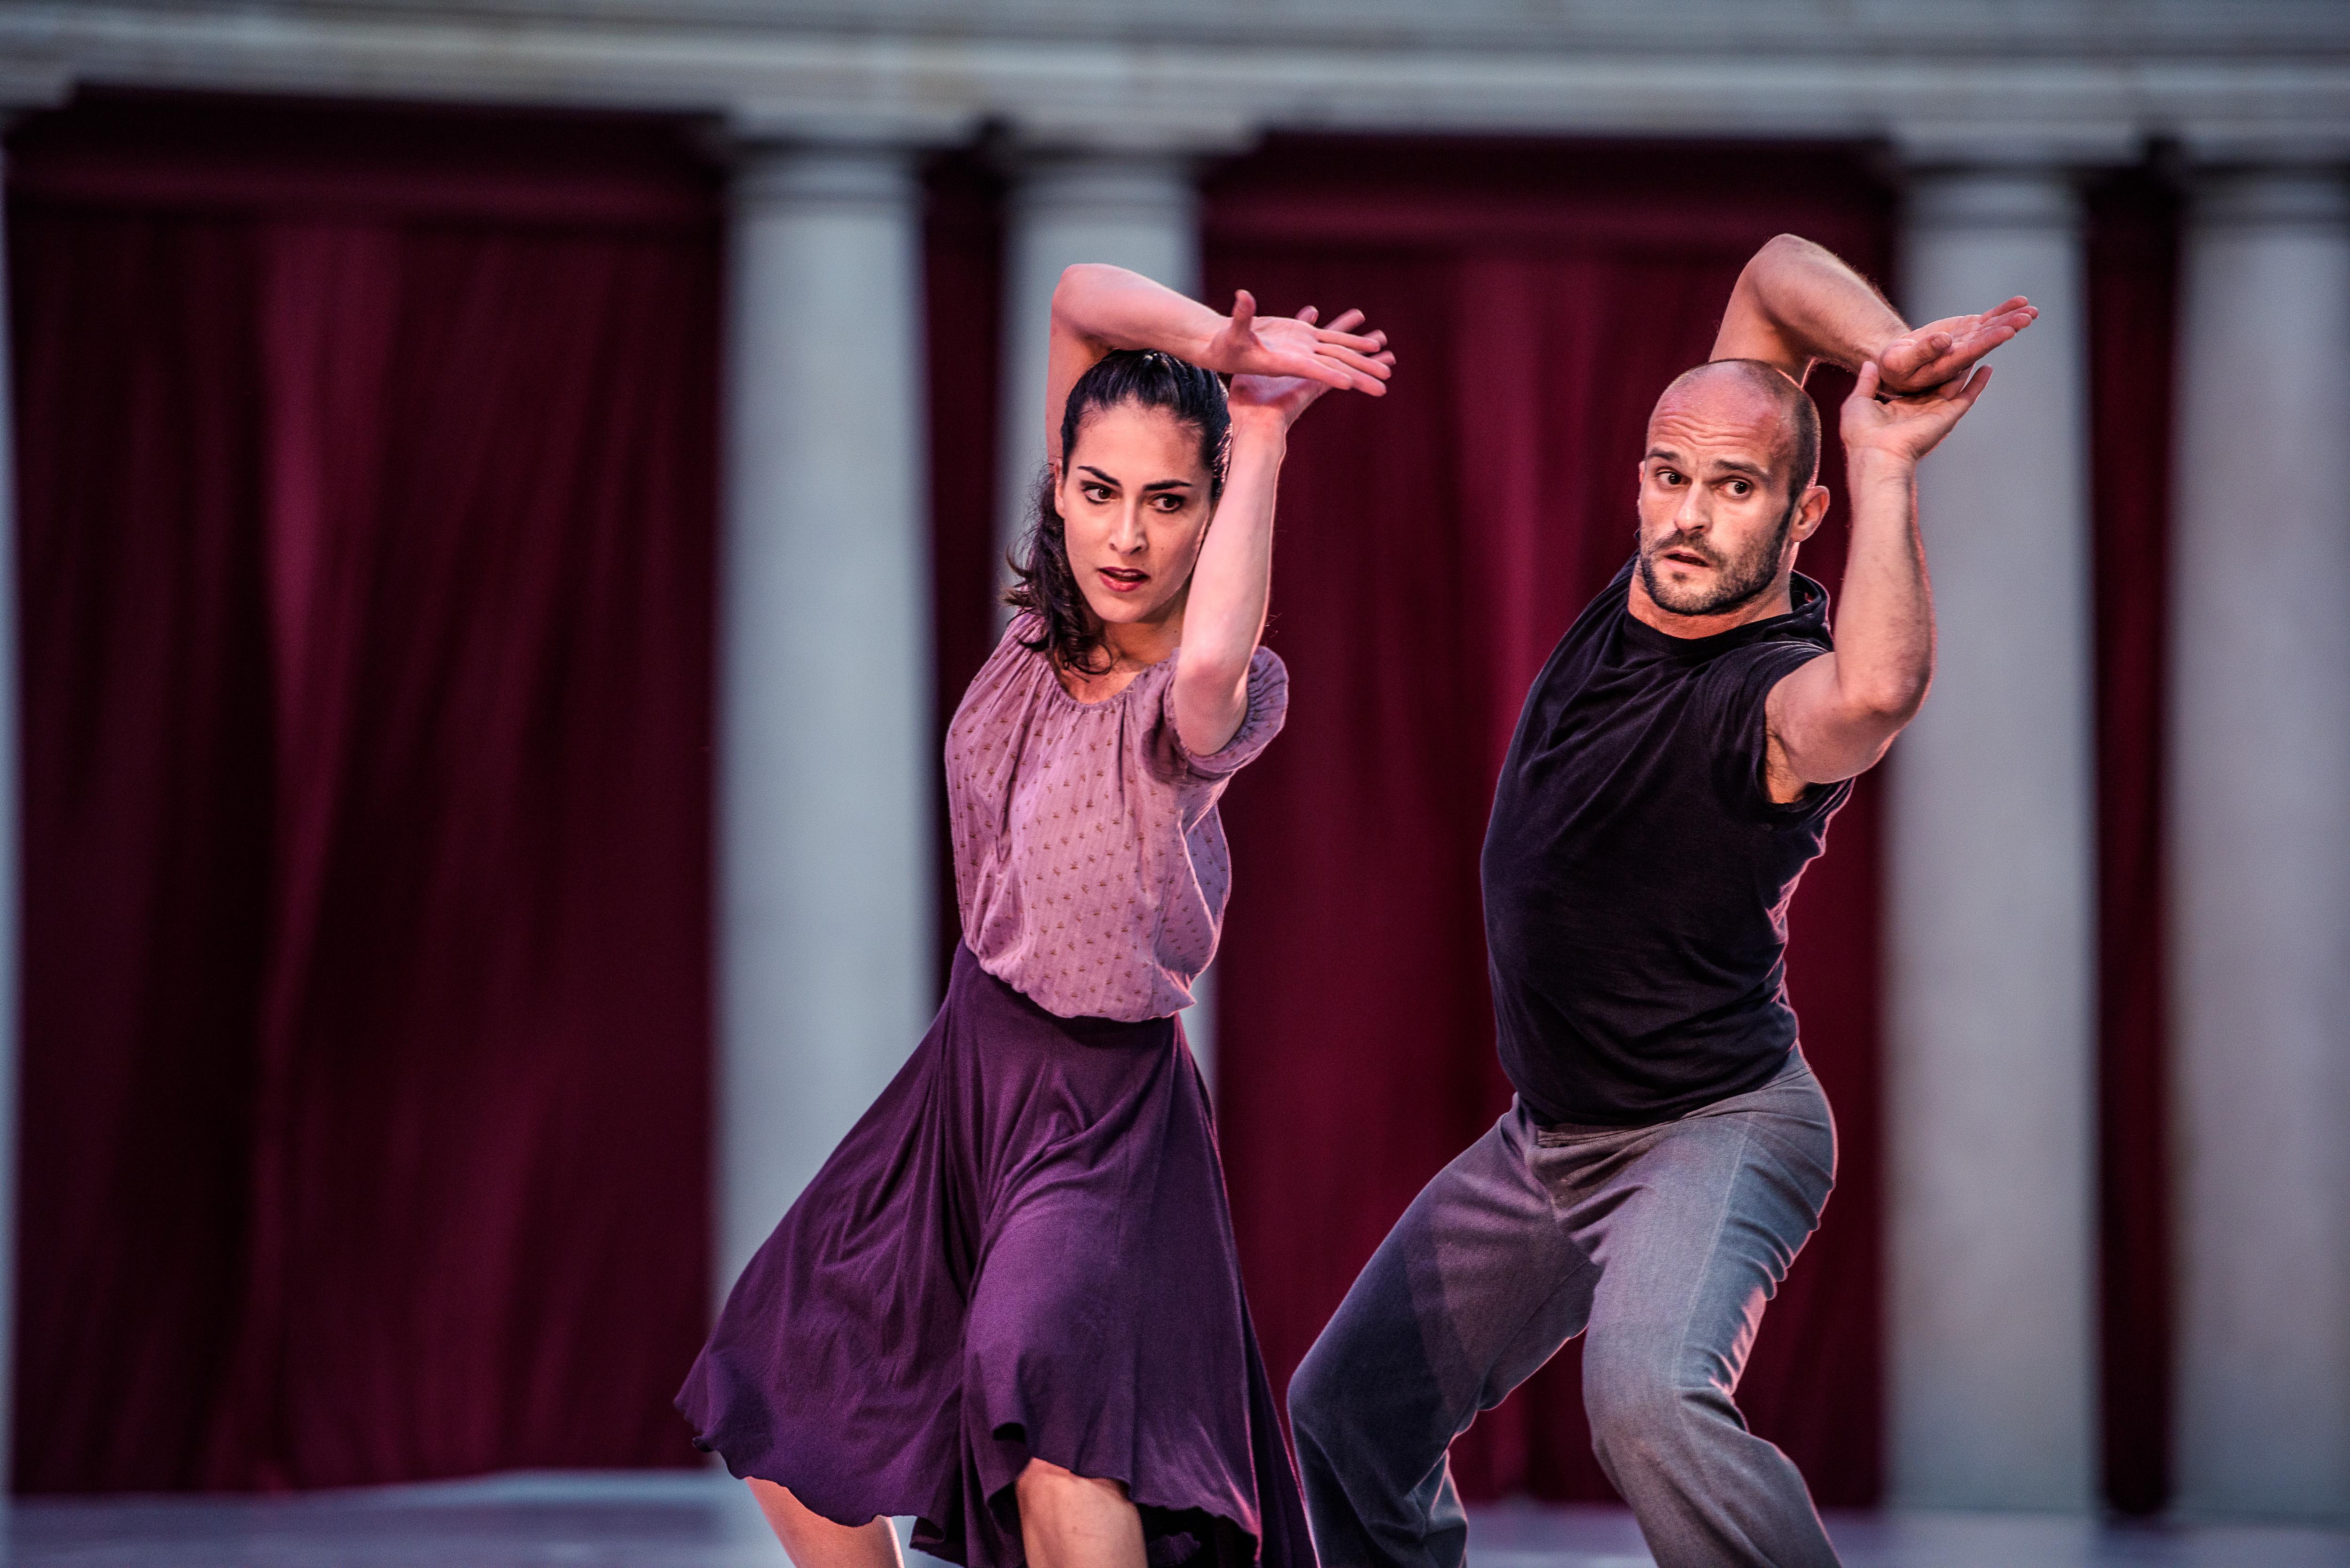 copenhagen_summer_dance_2016_-_dansk_danseteater_-_foto_soeren_meisner_-9373-2